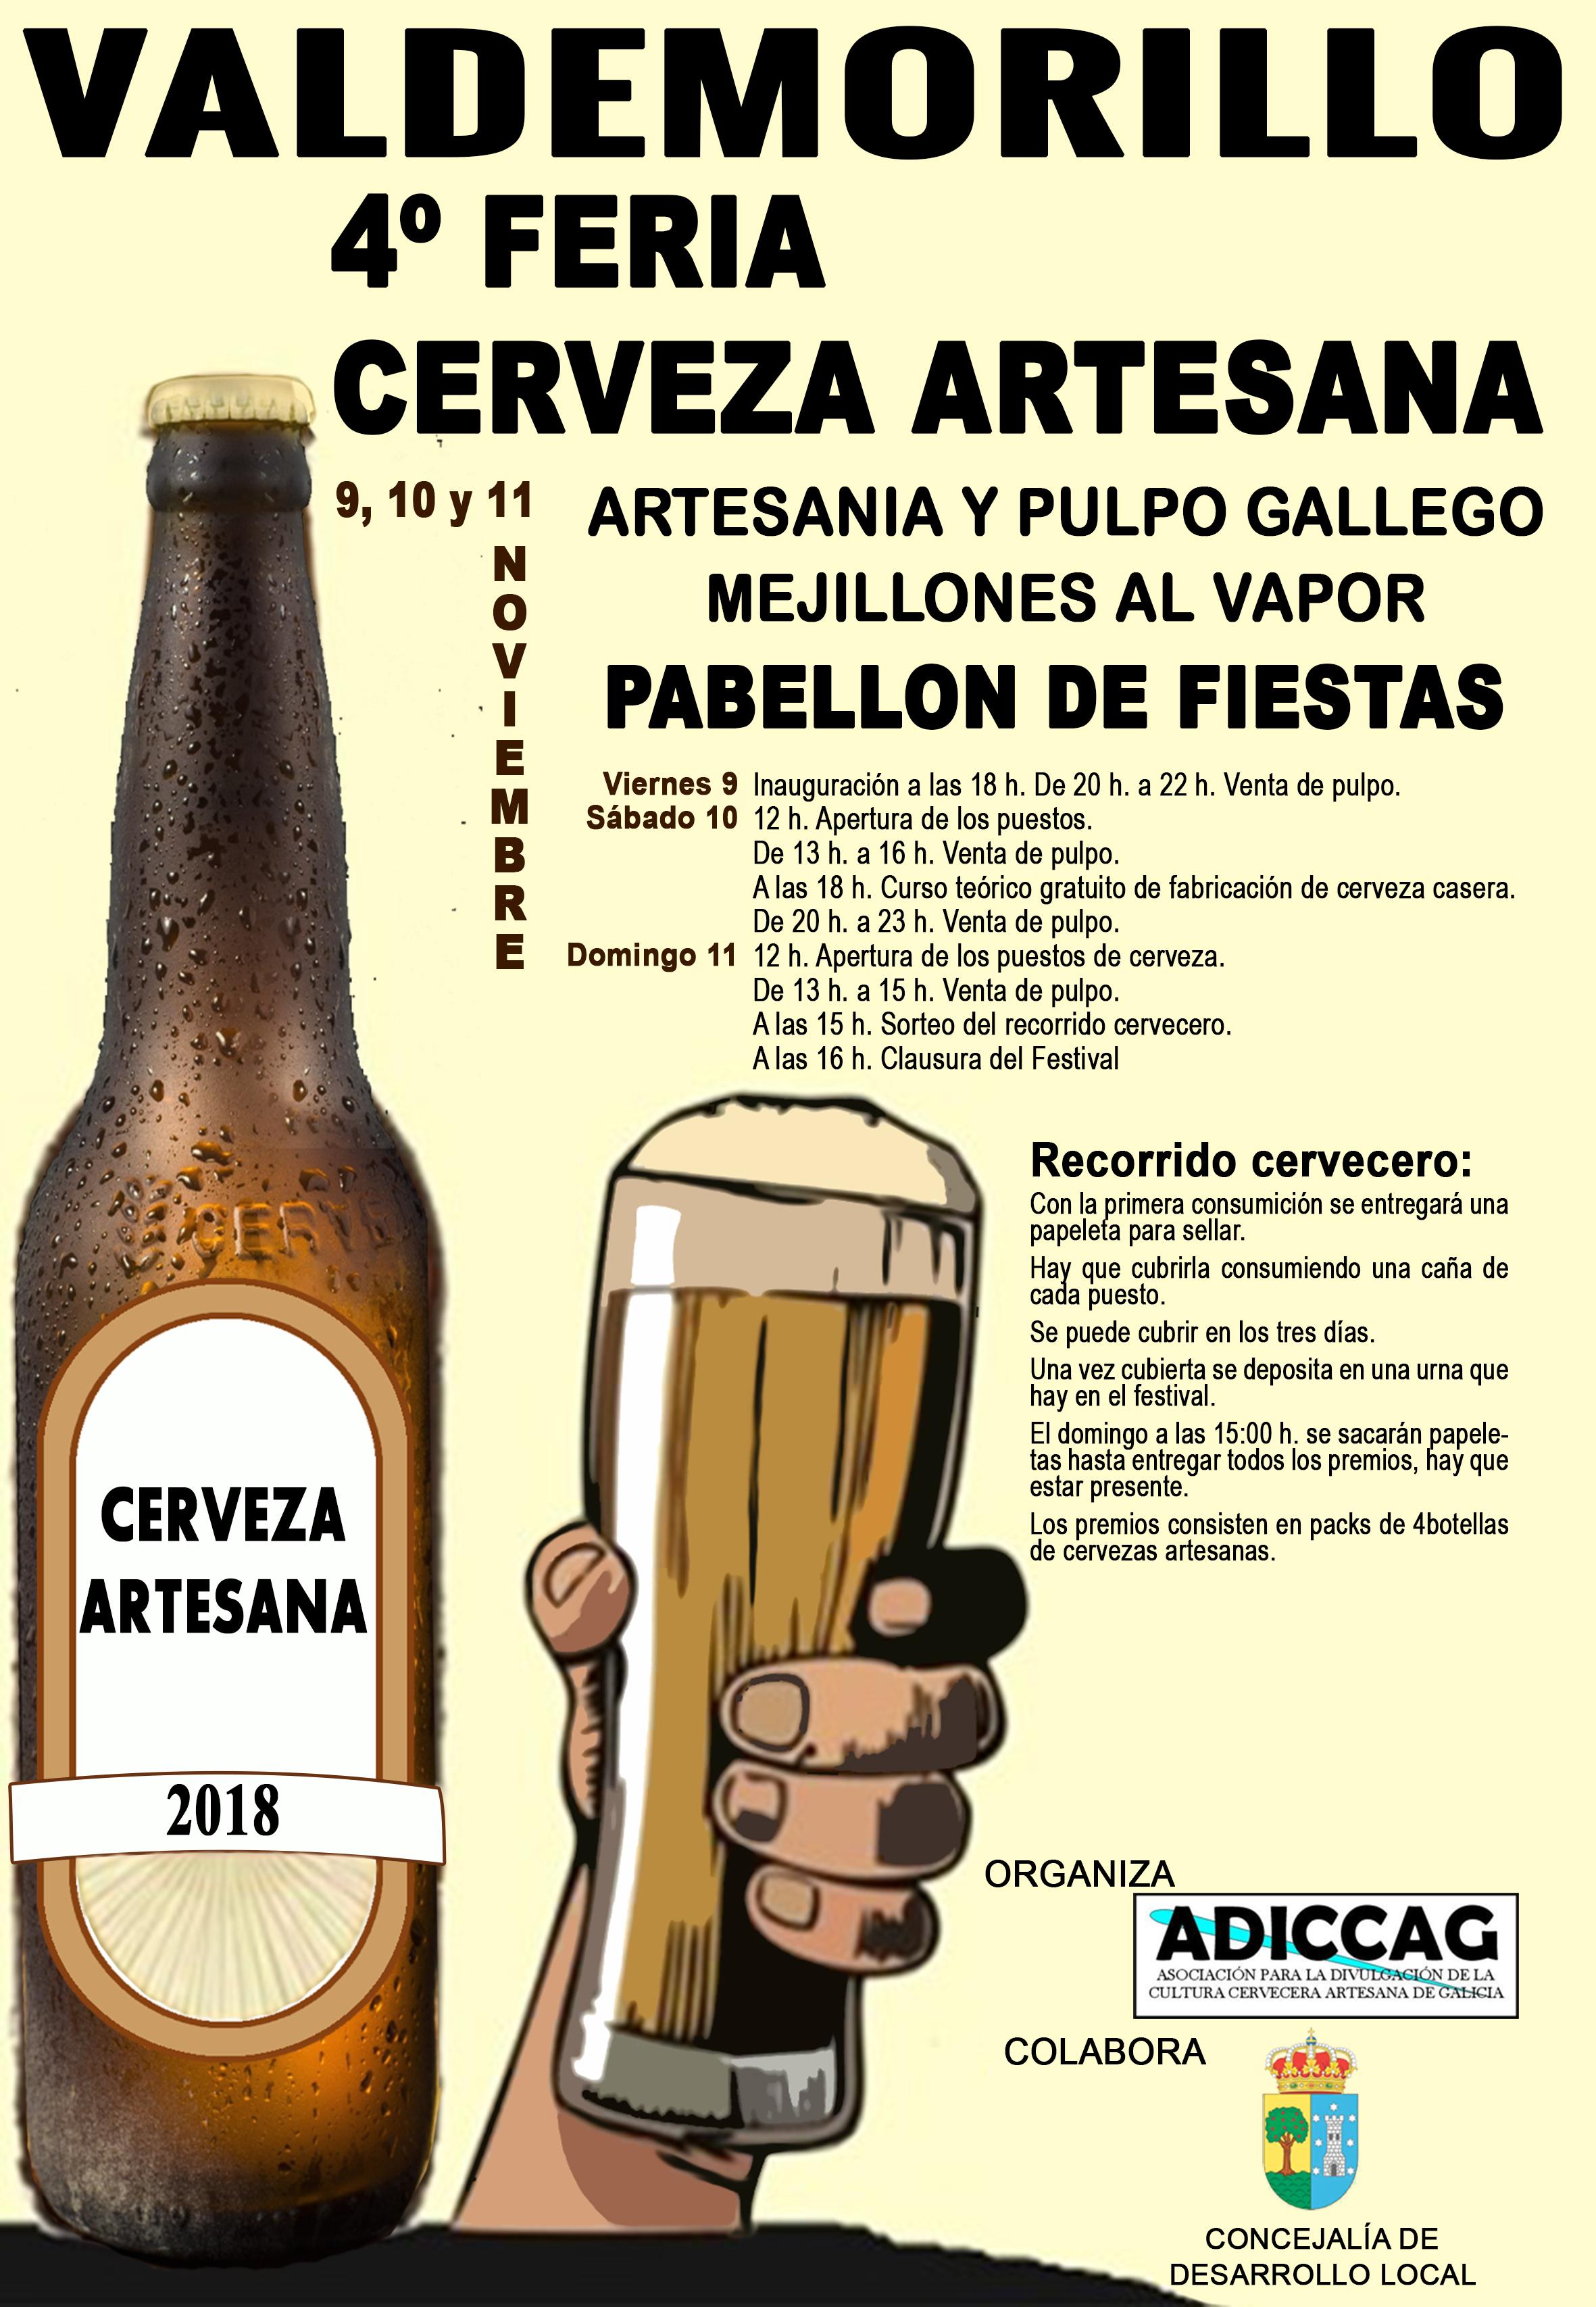 4º FERIA DE CERVEZA ARTESANA valdemorillo programa (4)